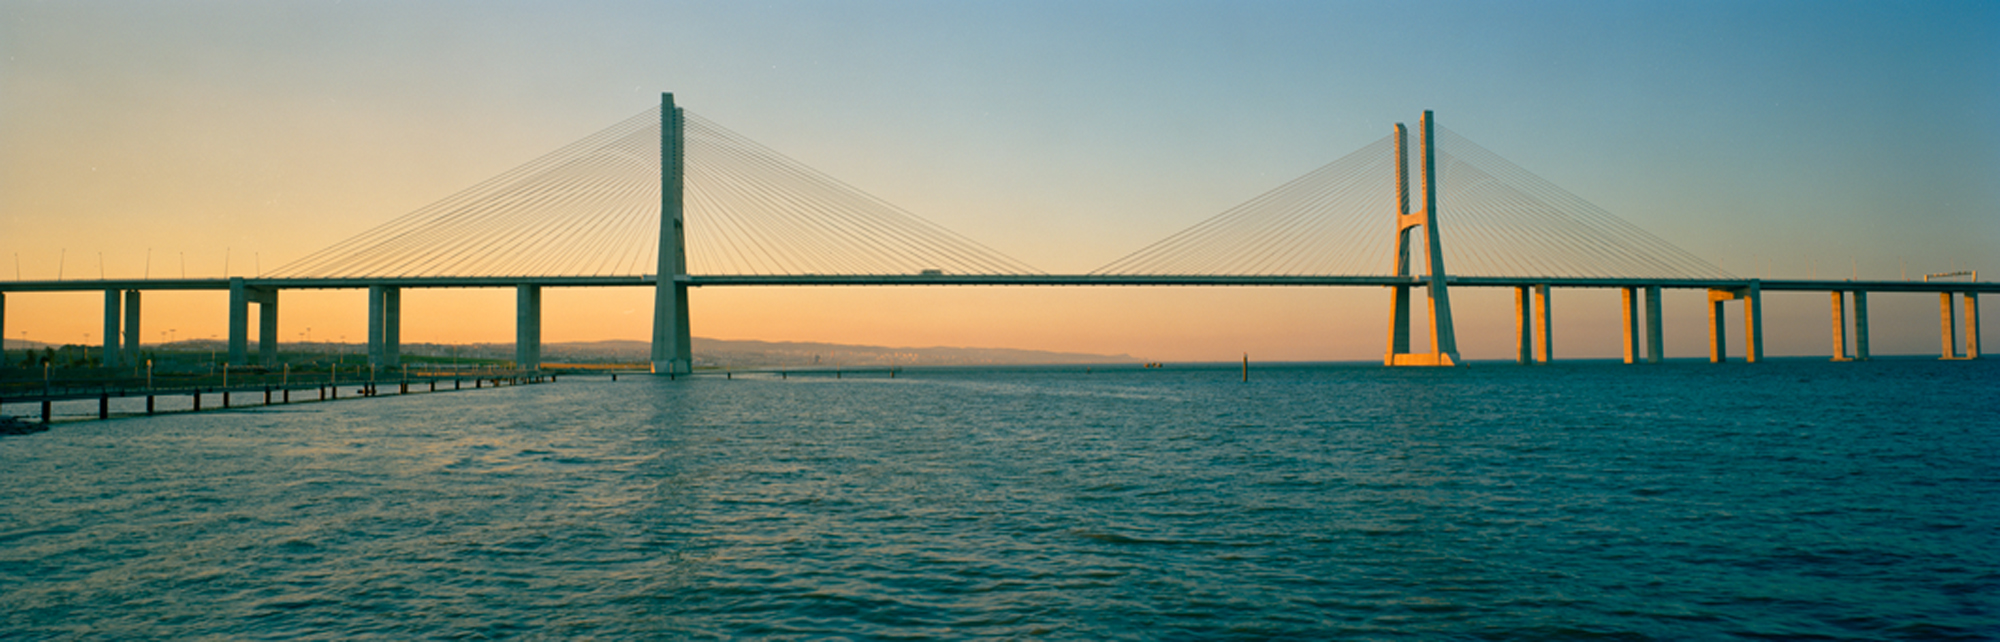 large format photography, Grossformatfotografie, Grossformatphotographie, Fotografie, Photographie, photography, 6x17, city, Stadt, Architektur, architecture, Beton, Stahl, concrete, steel, Brücke, bridge, Lissabon, Lisboa